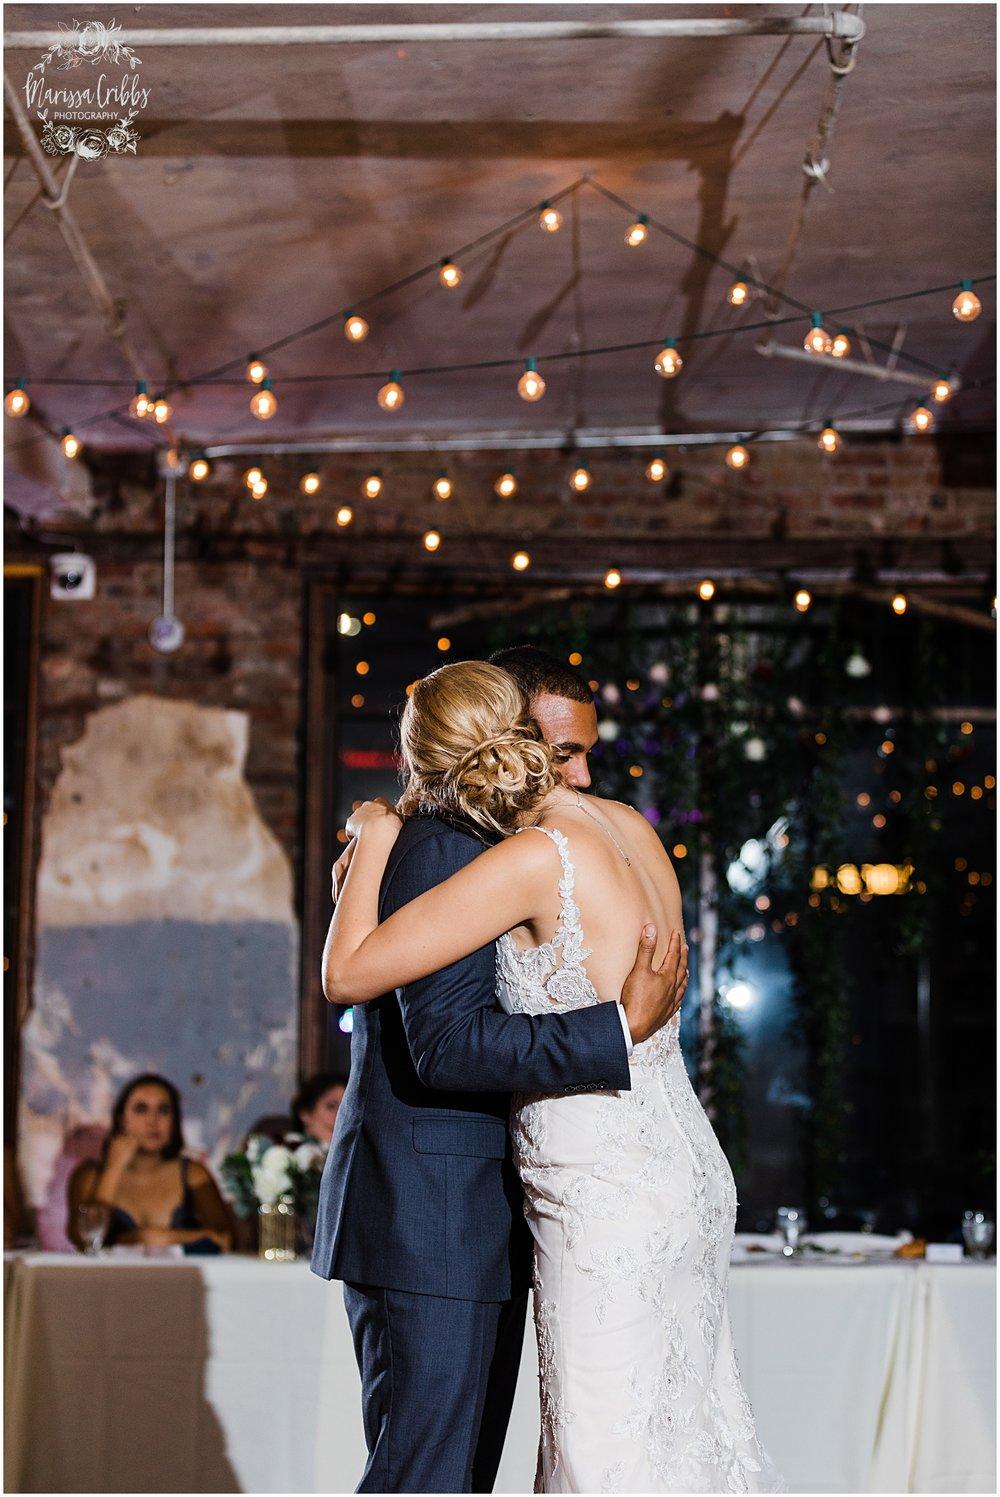 BAUER WEDDING | KELSEA & JUSTIN | MARISSA CRIBBS PHOTOGRAPHY_6596.jpg